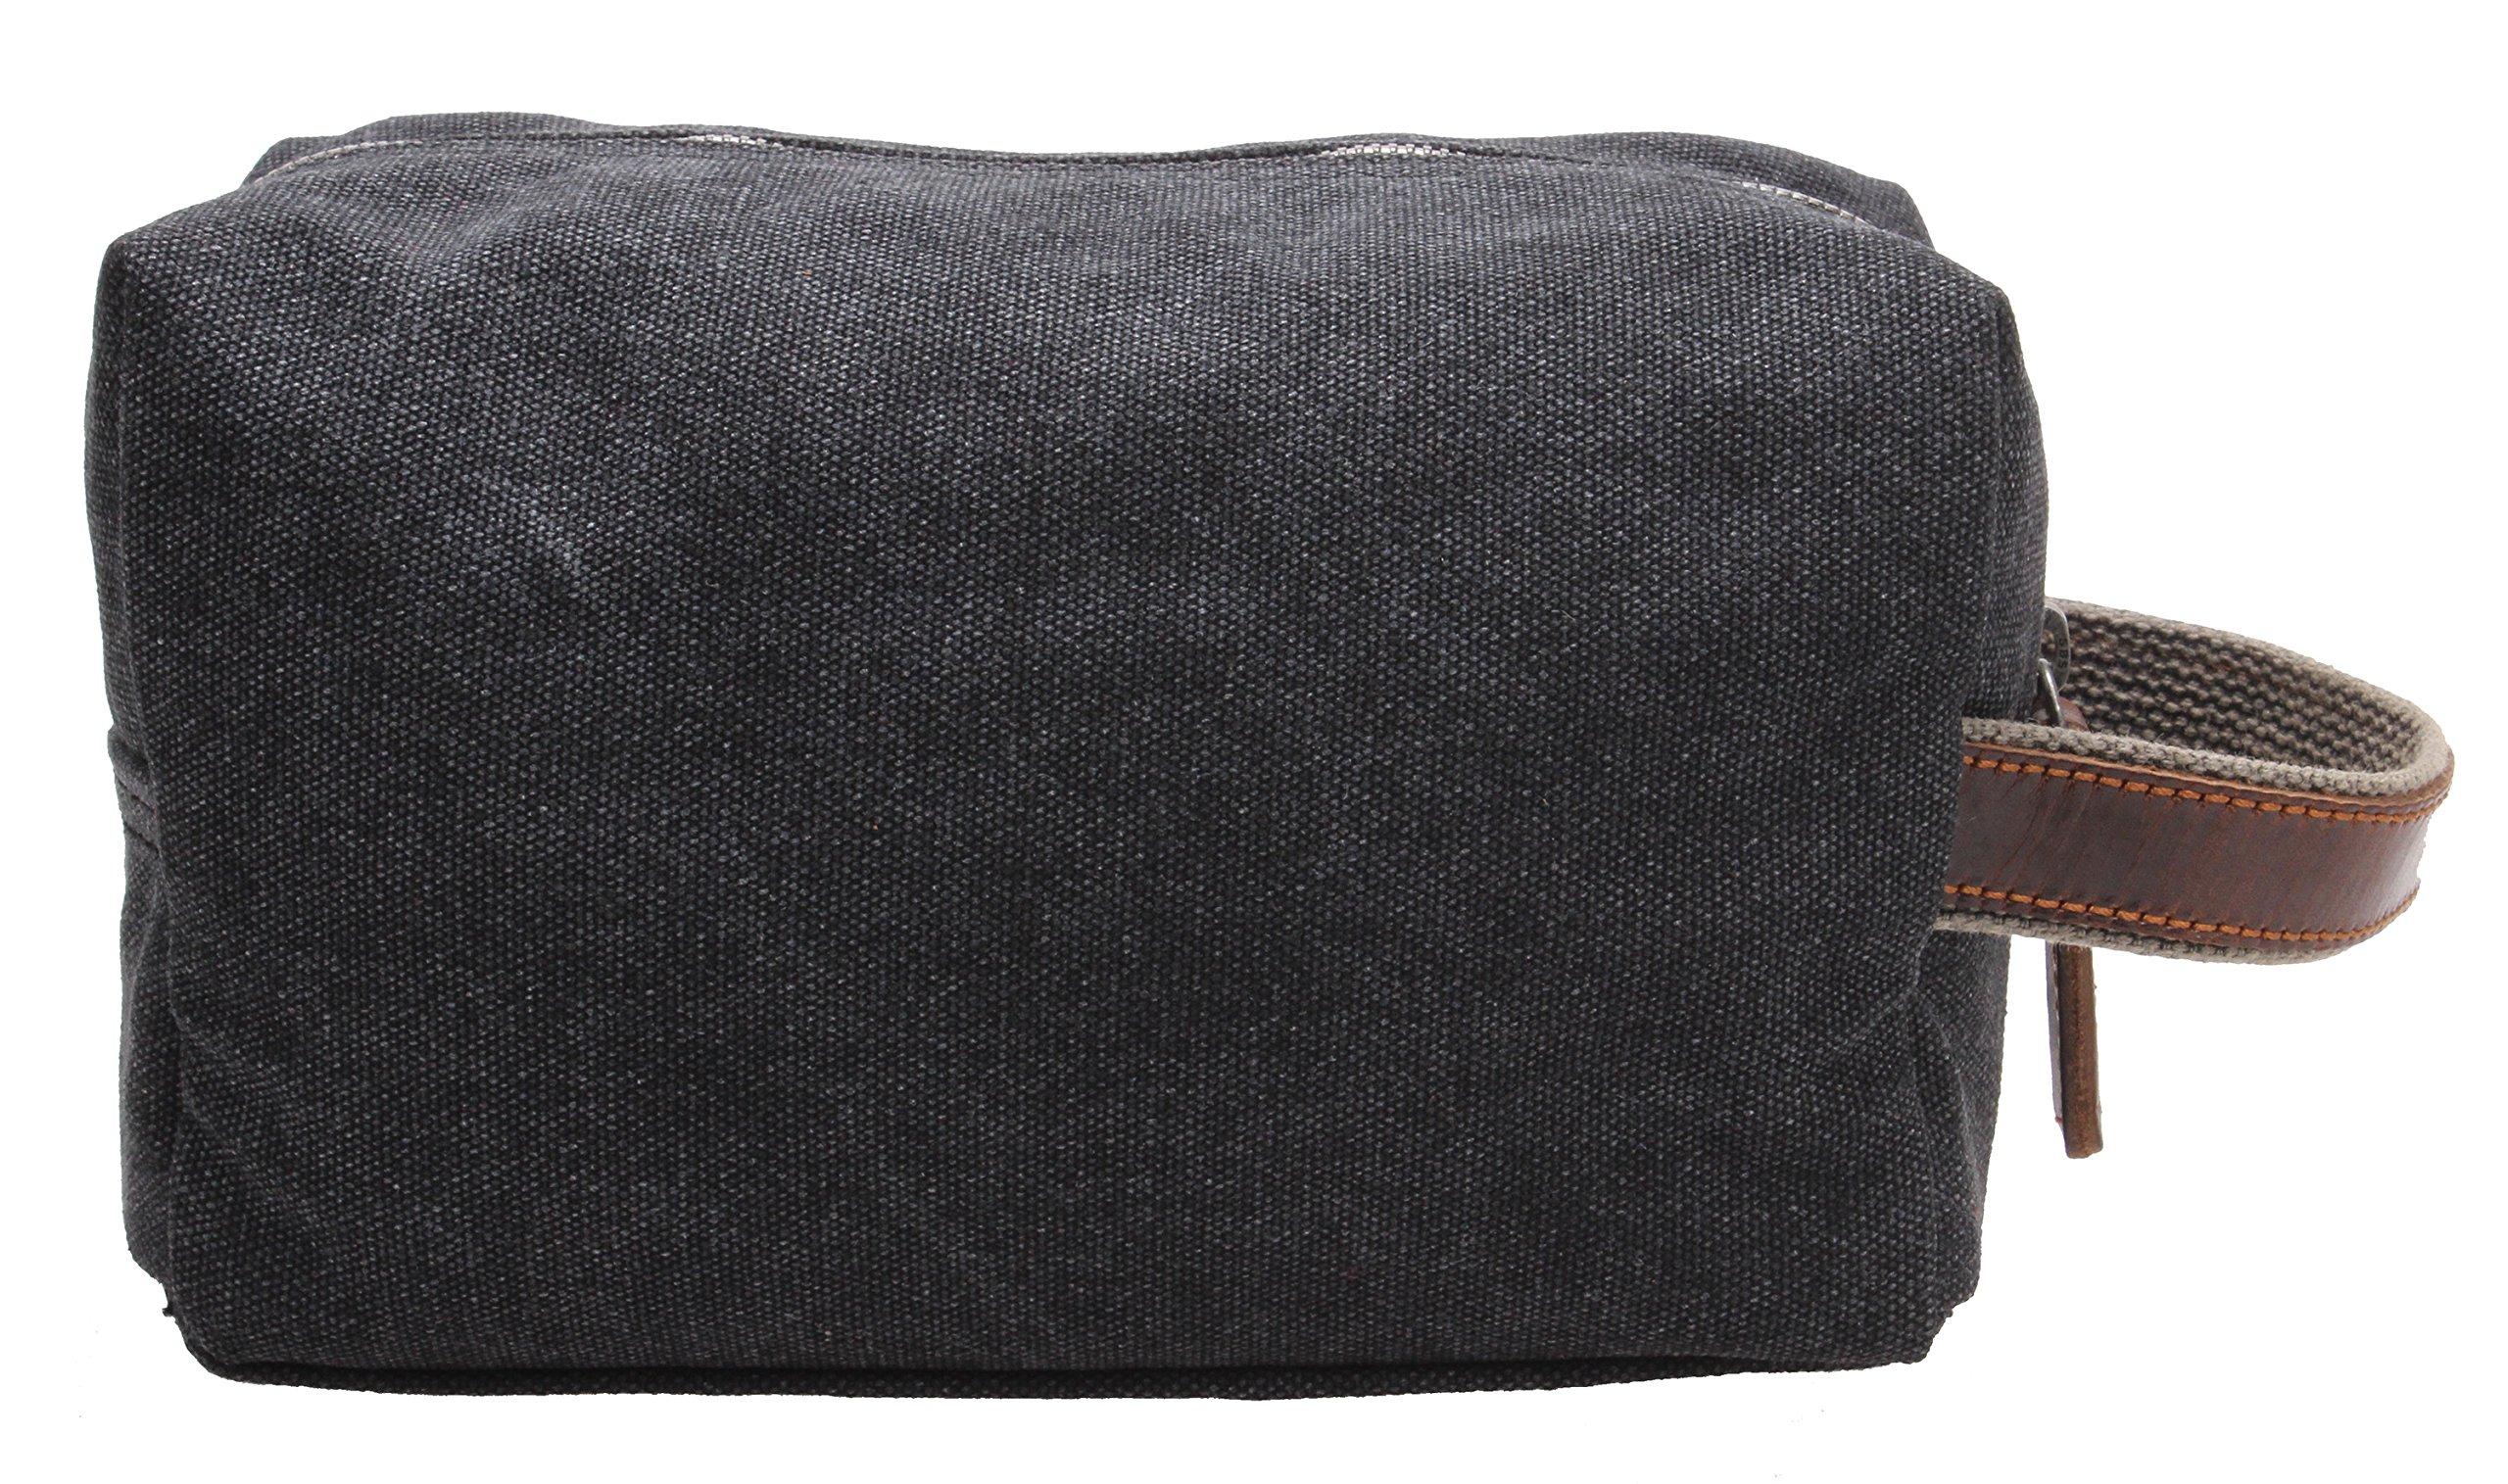 Canvas Travel Toiletry Organizer Shaving Dopp Kit Cosmetic Makeup Bag 9 Inch #B4 (grey) by OMAROA (Image #4)